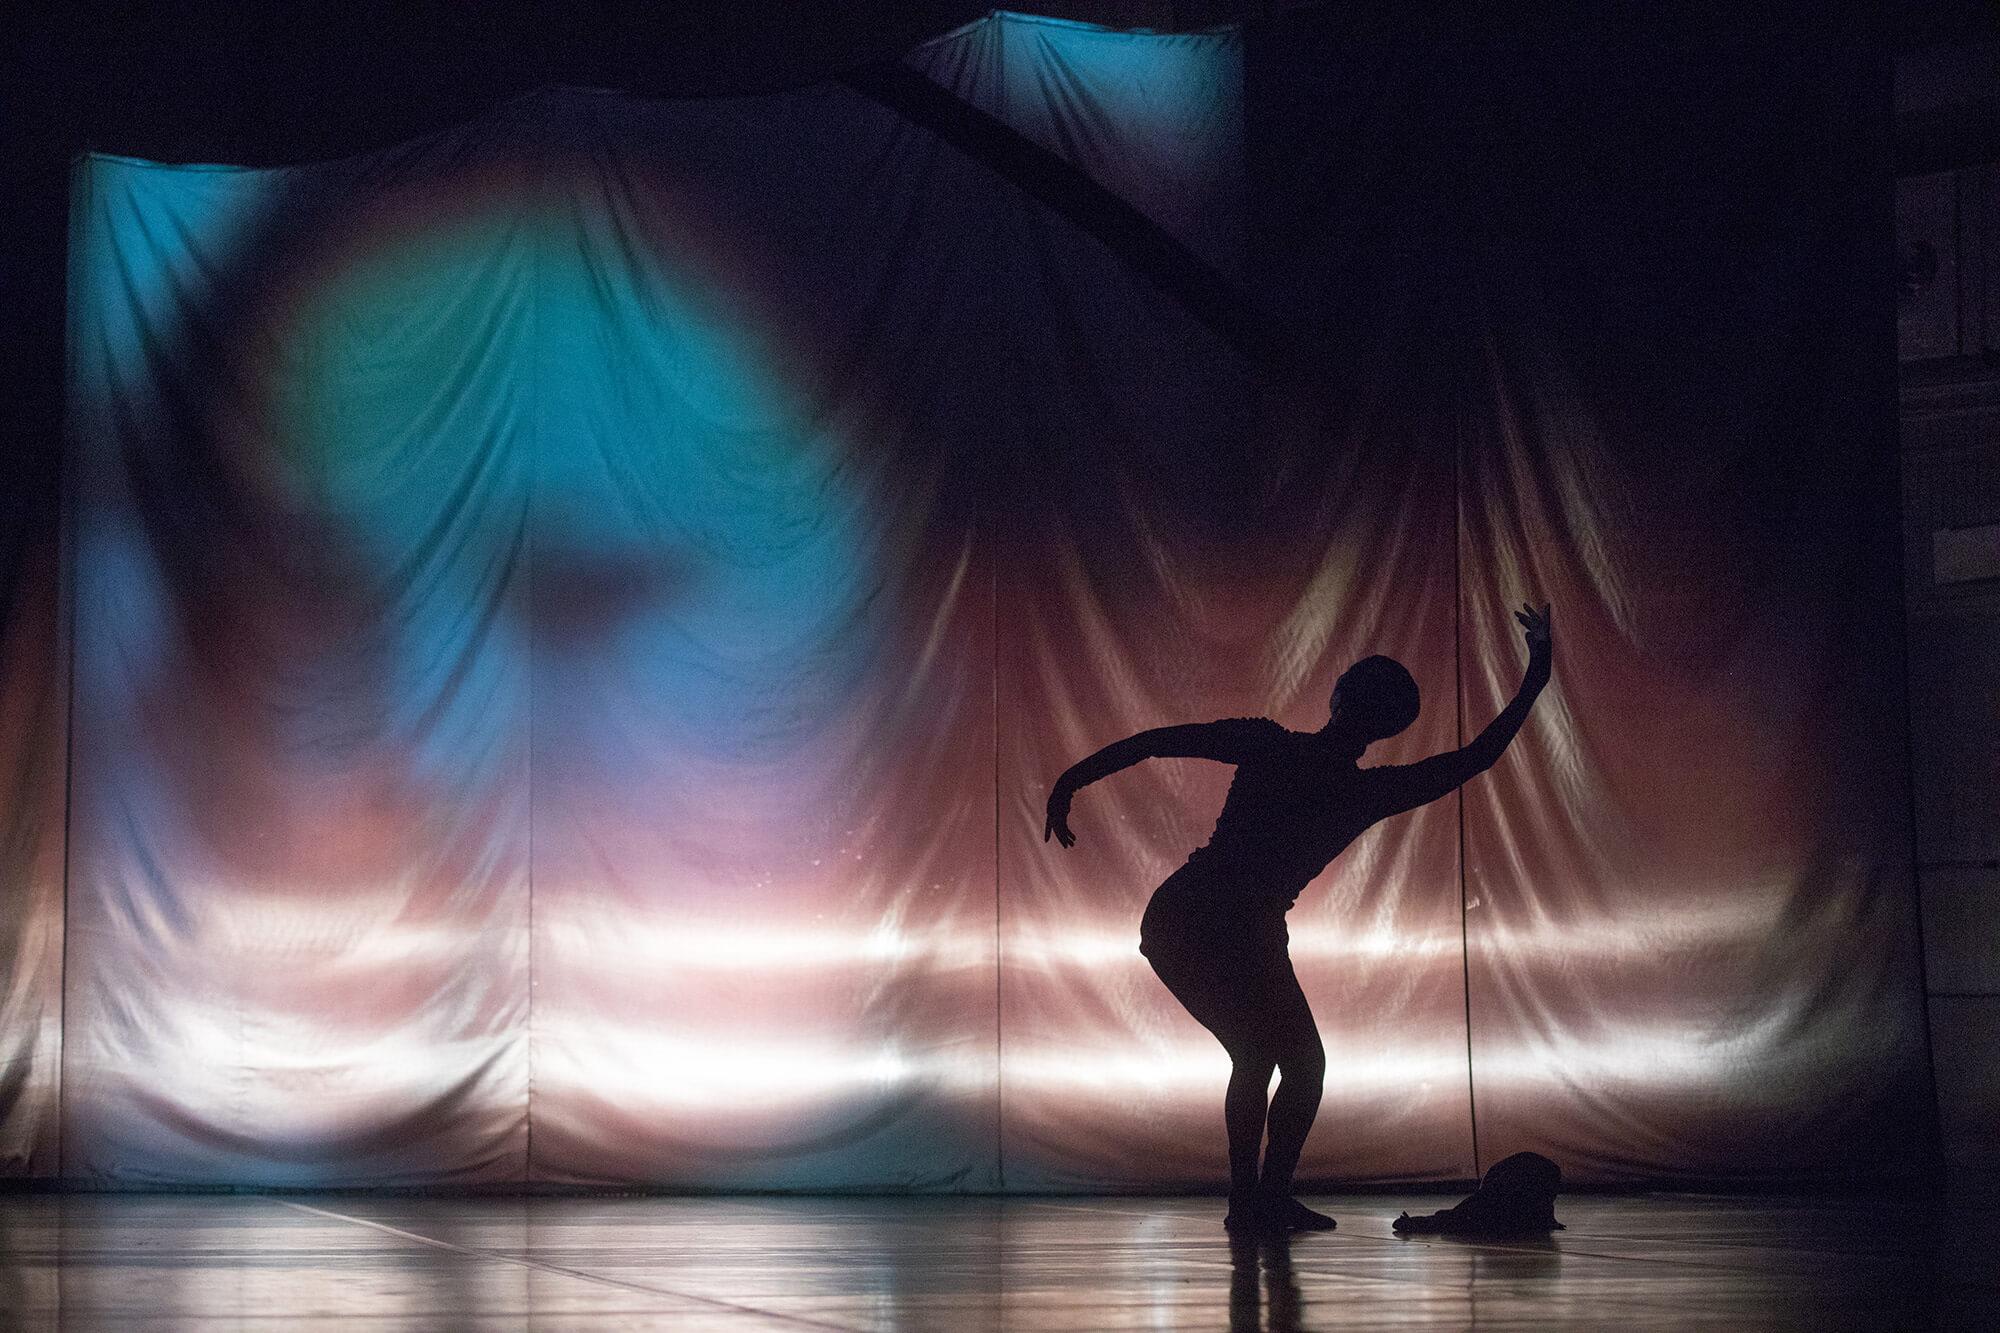 《Almost 55喬楊》在今年1月首演,整齣舞作只有喬楊一個人在台上。(攝影:Moon 9 Image)